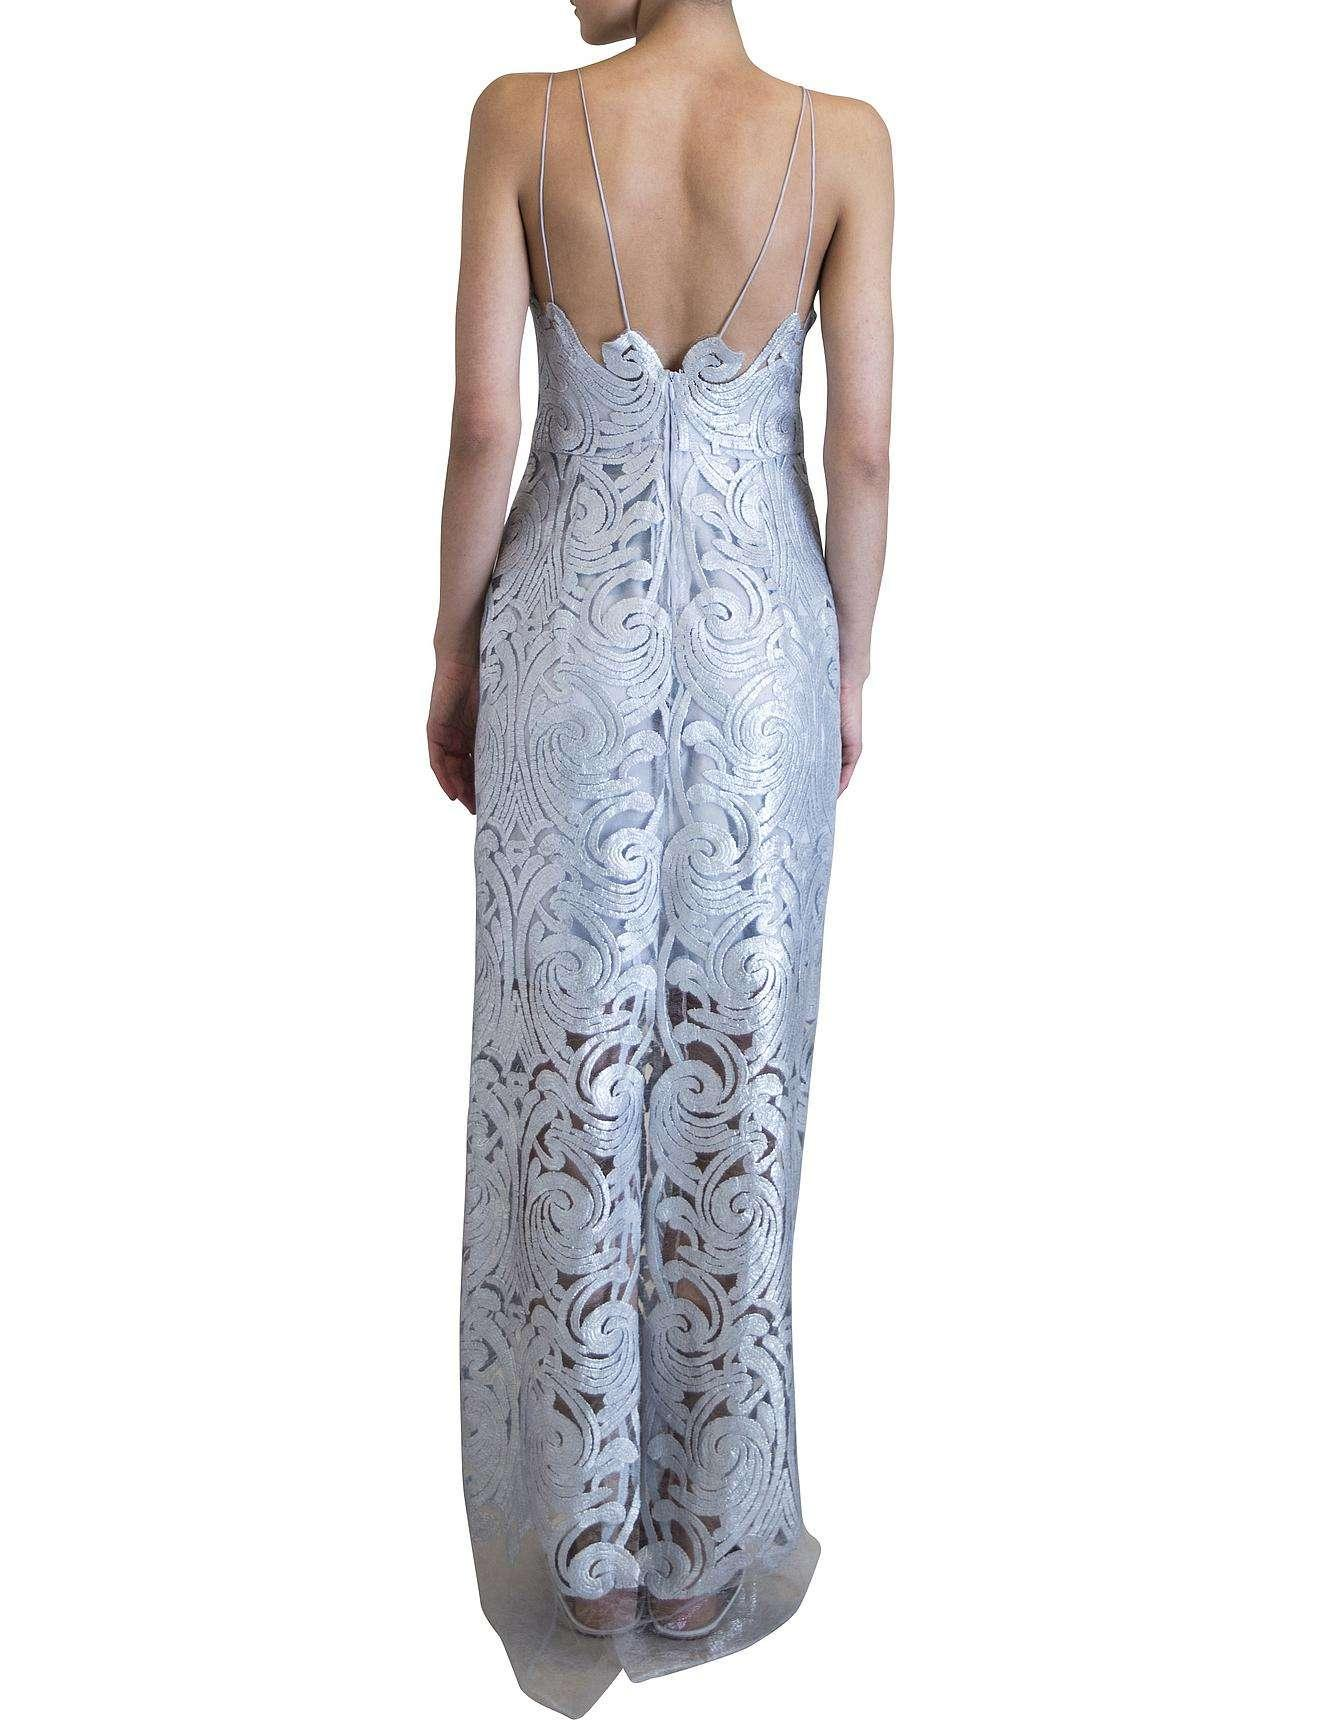 Carla Zampatti Pale Blue Lace Versailles Lace Gown